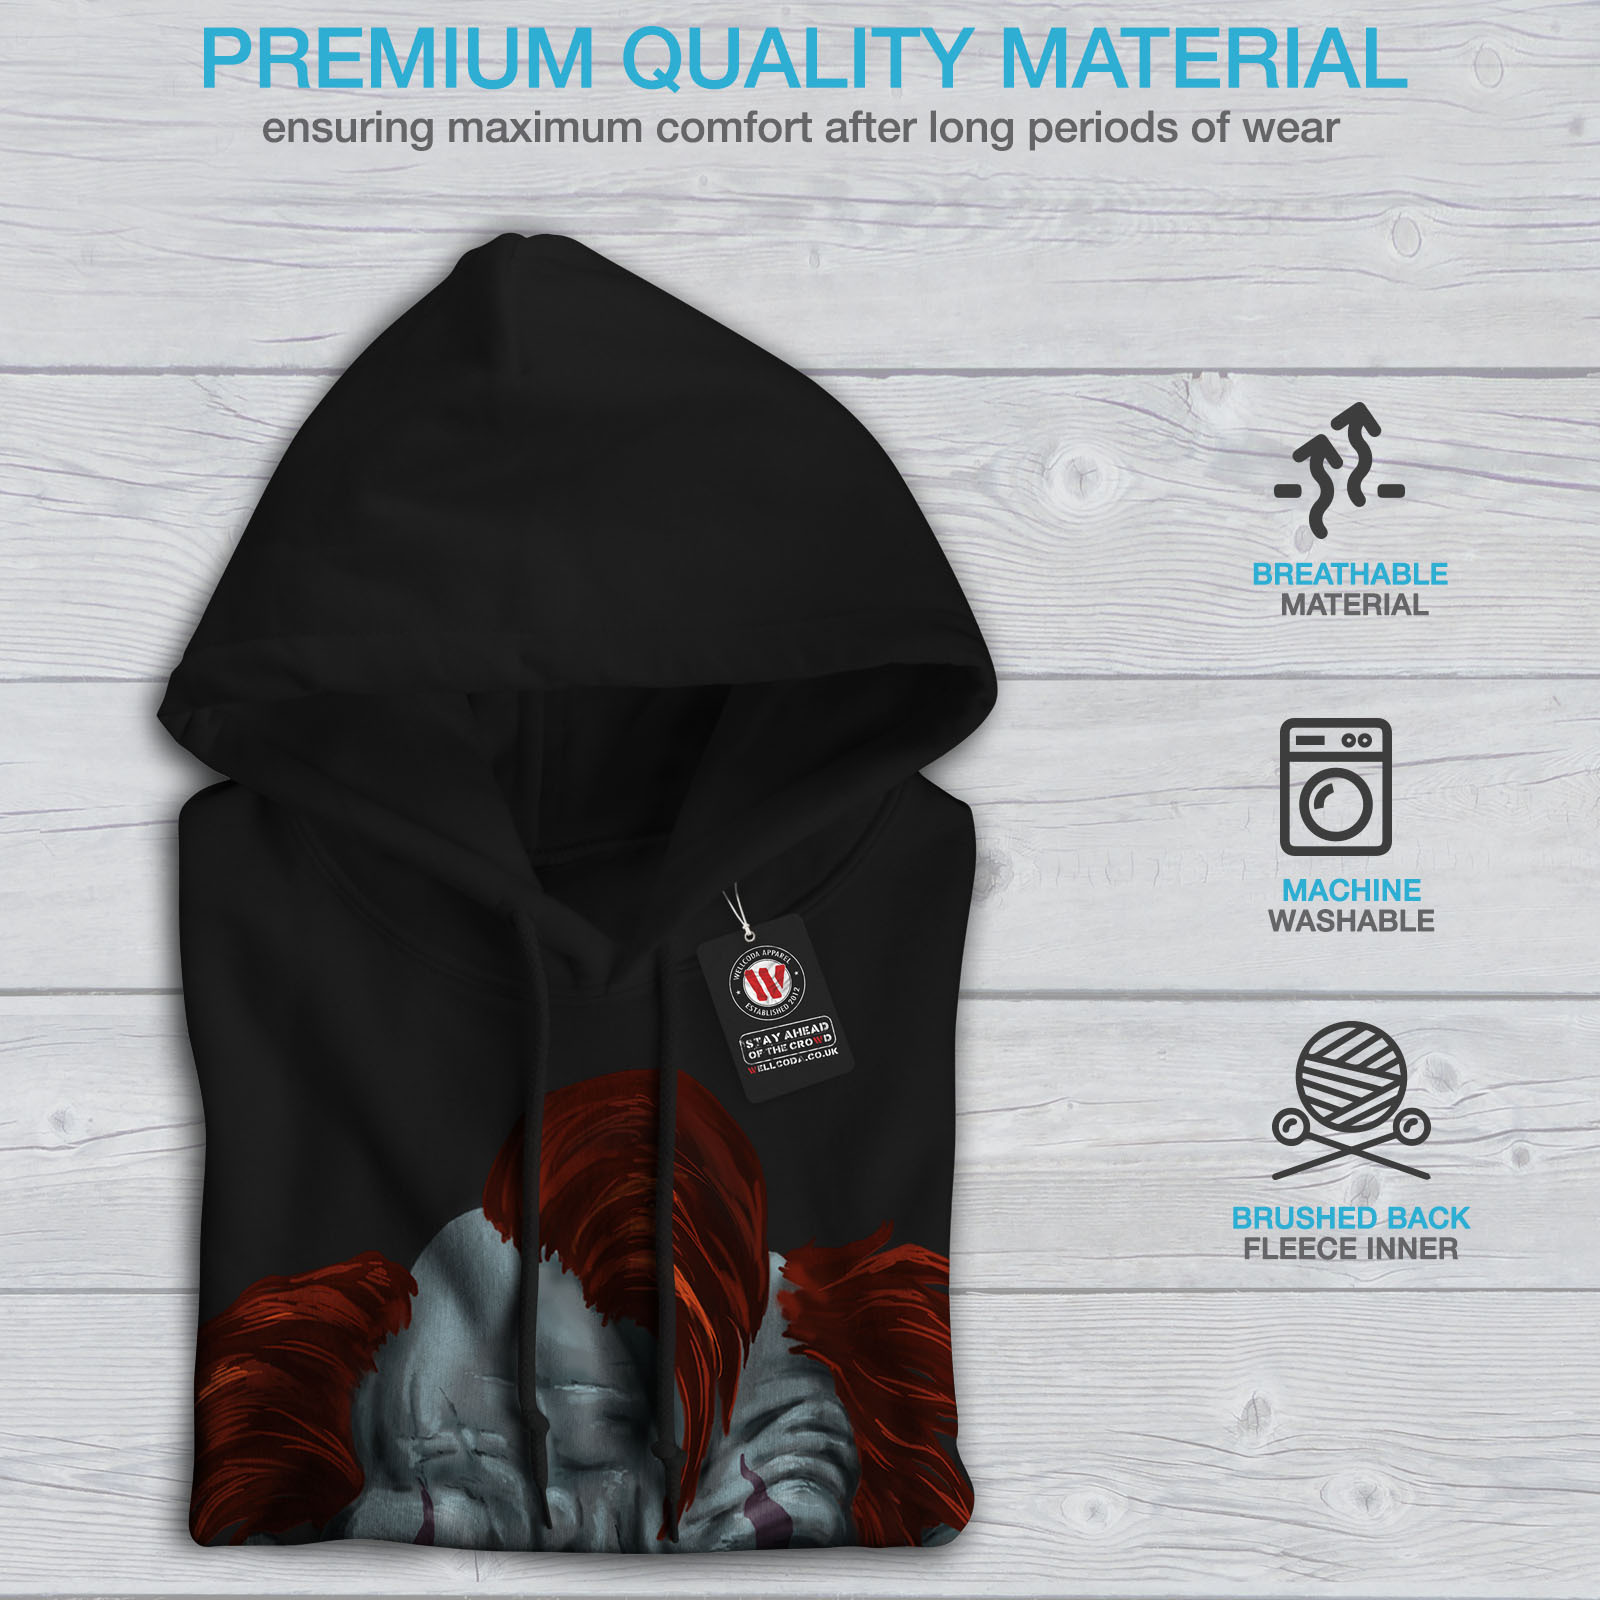 Scary Art Pullover Jumper wellcoda Death Slogan End Womens Sweatshirt